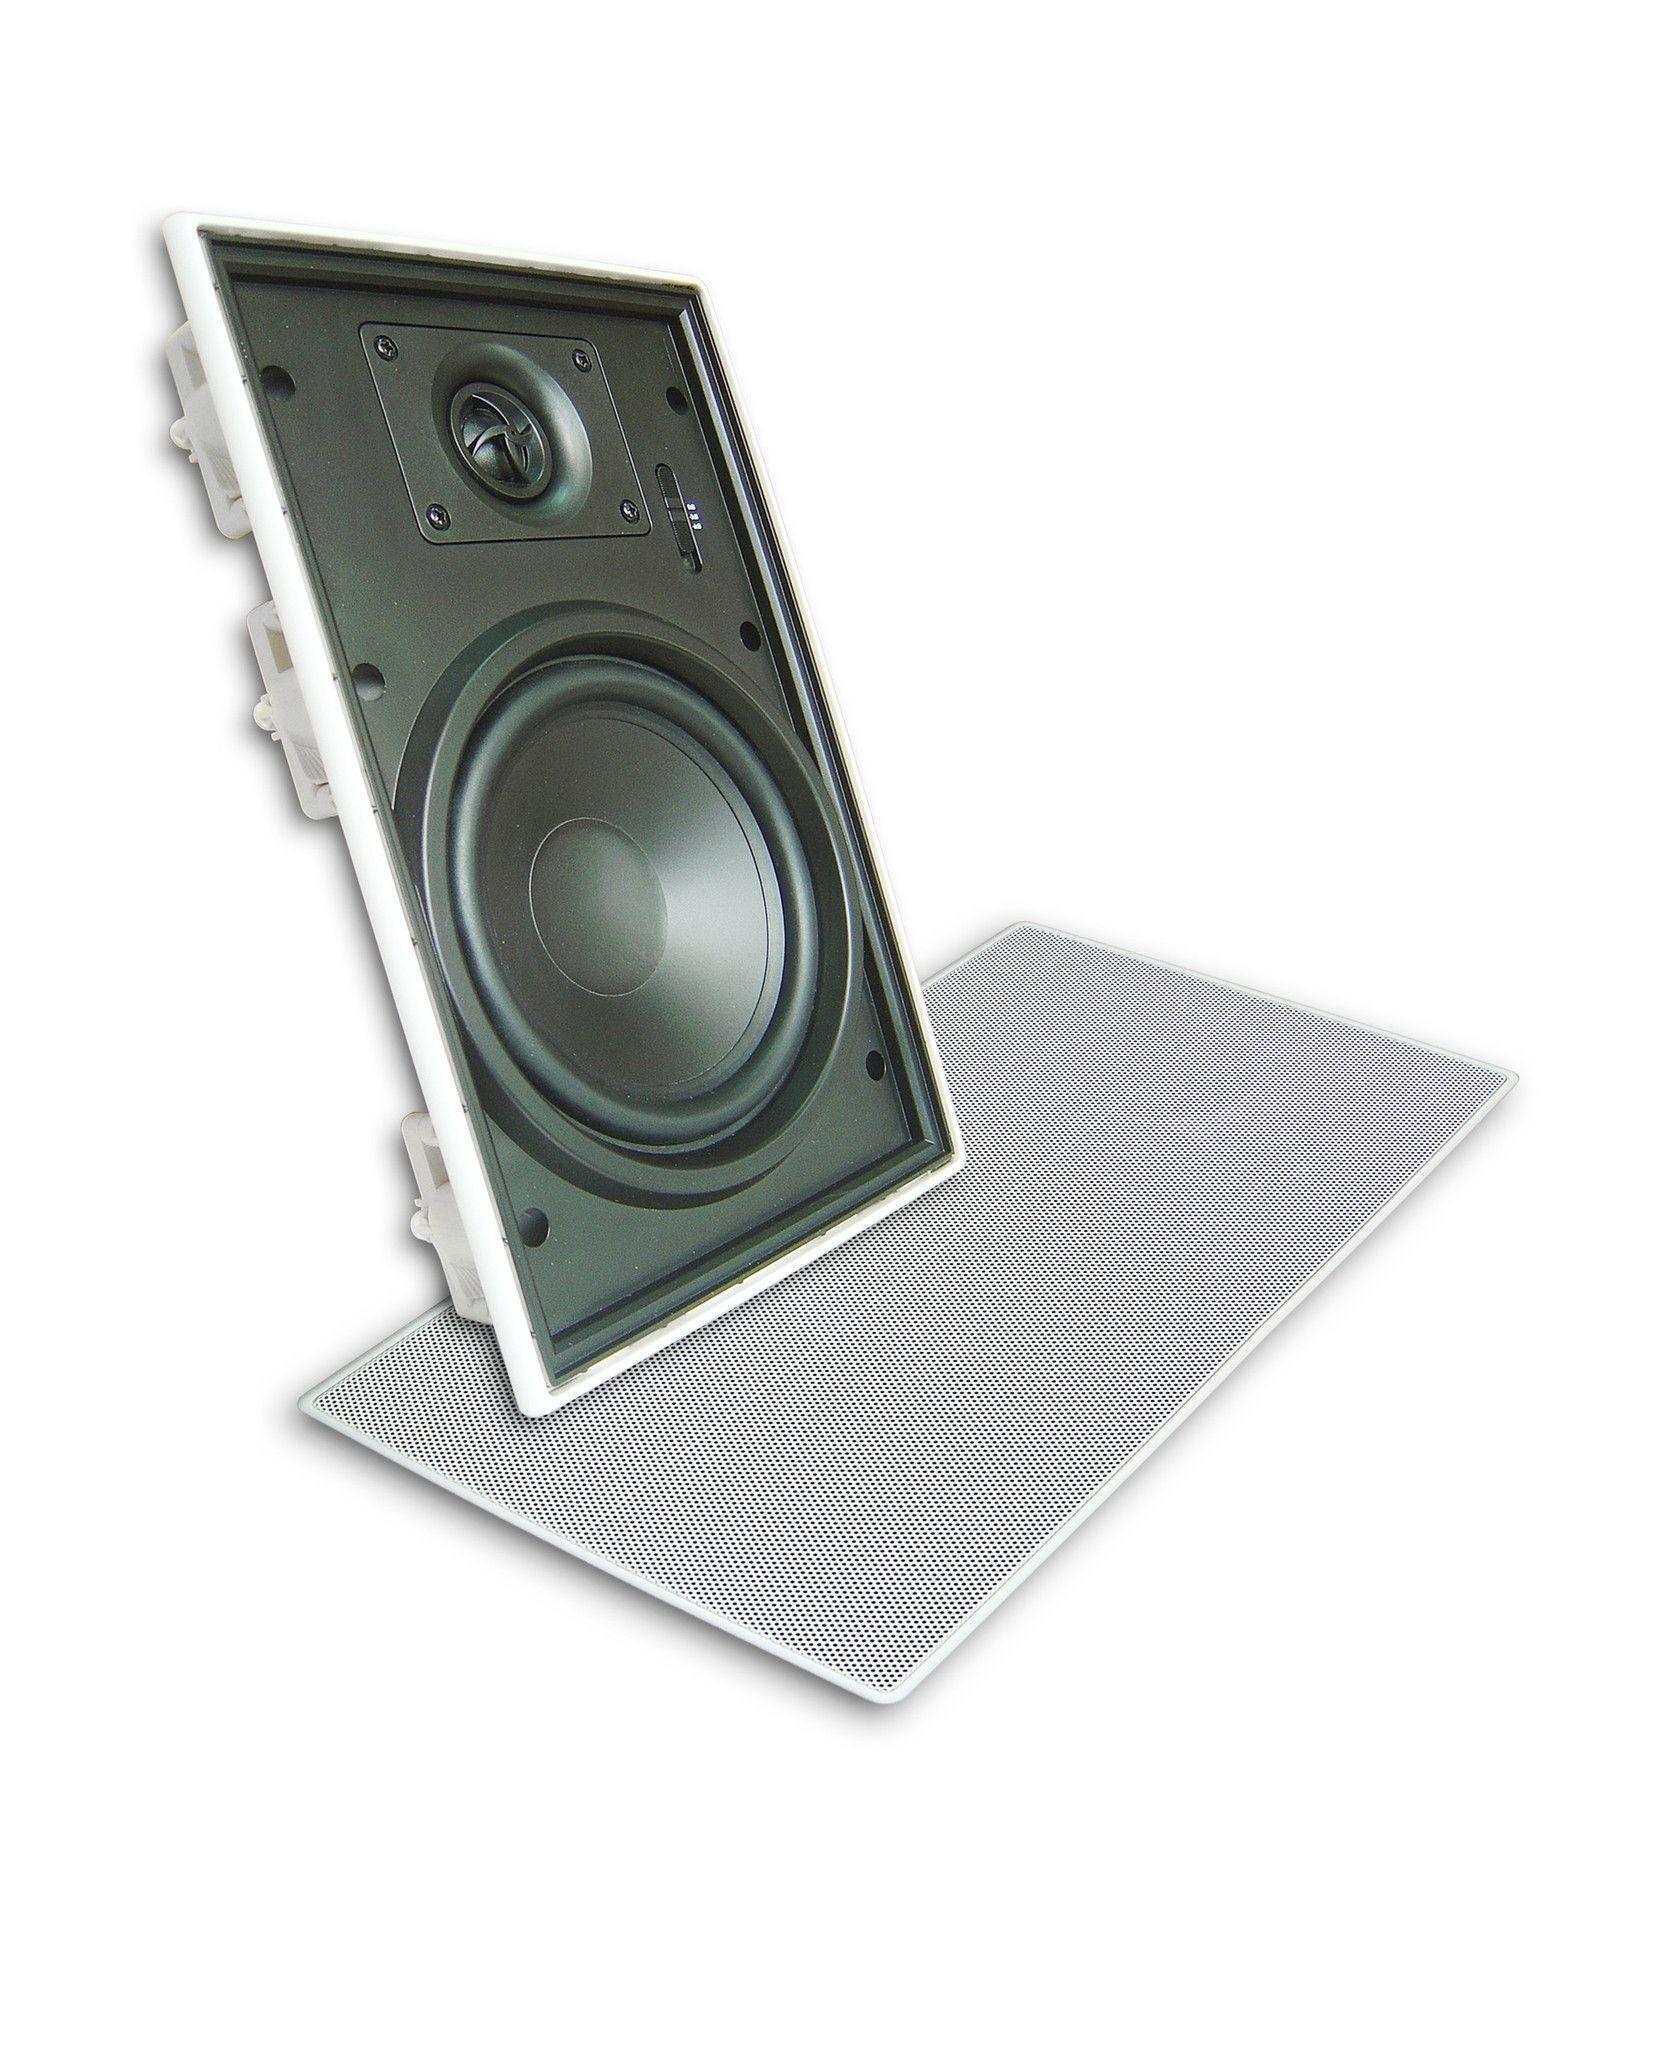 Premium Home Office Computer Woofers Speakers | Woofer speaker ...